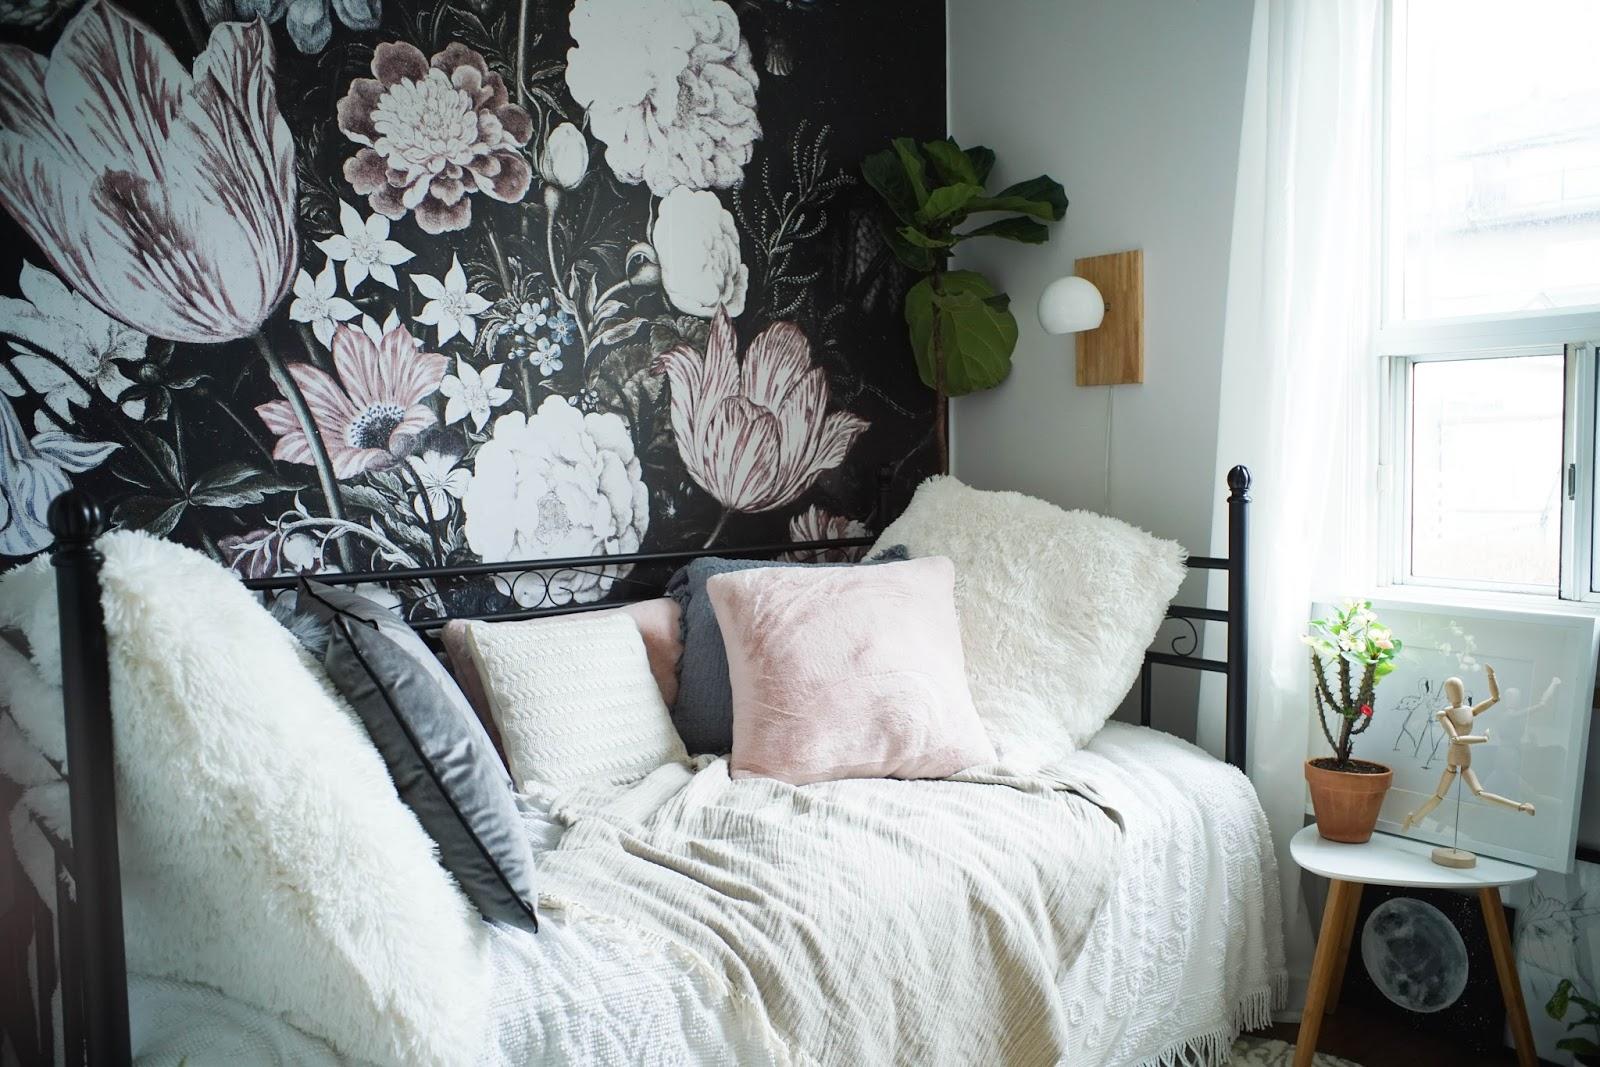 JYSK Tiny Room Makeover - THE PARTY PARADE